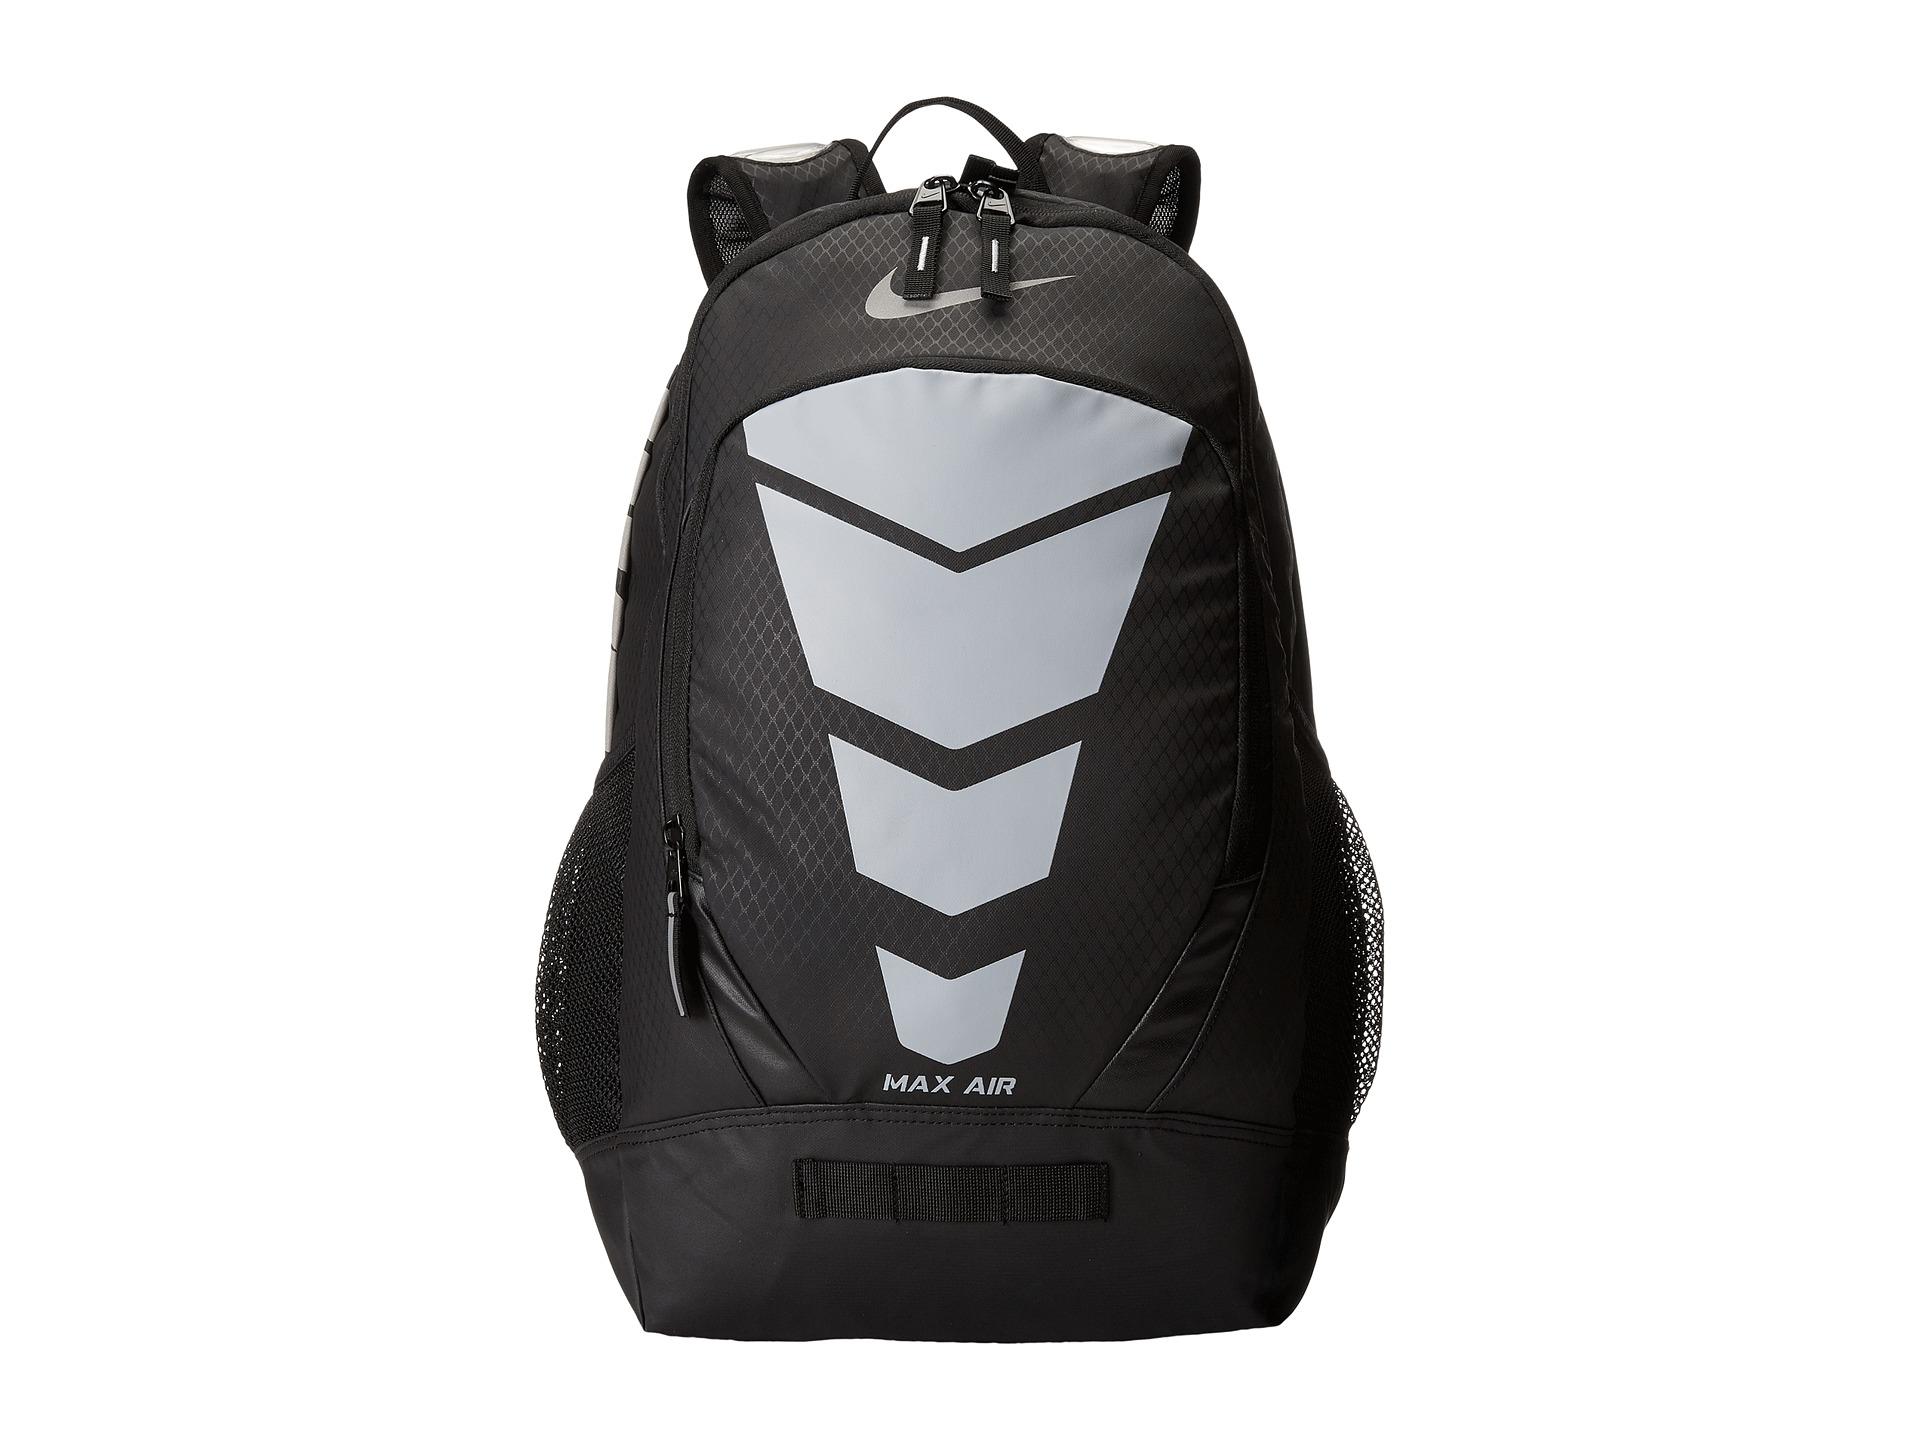 Lyst - Nike Max Air Vapor Backpack in Black bbe1fe662